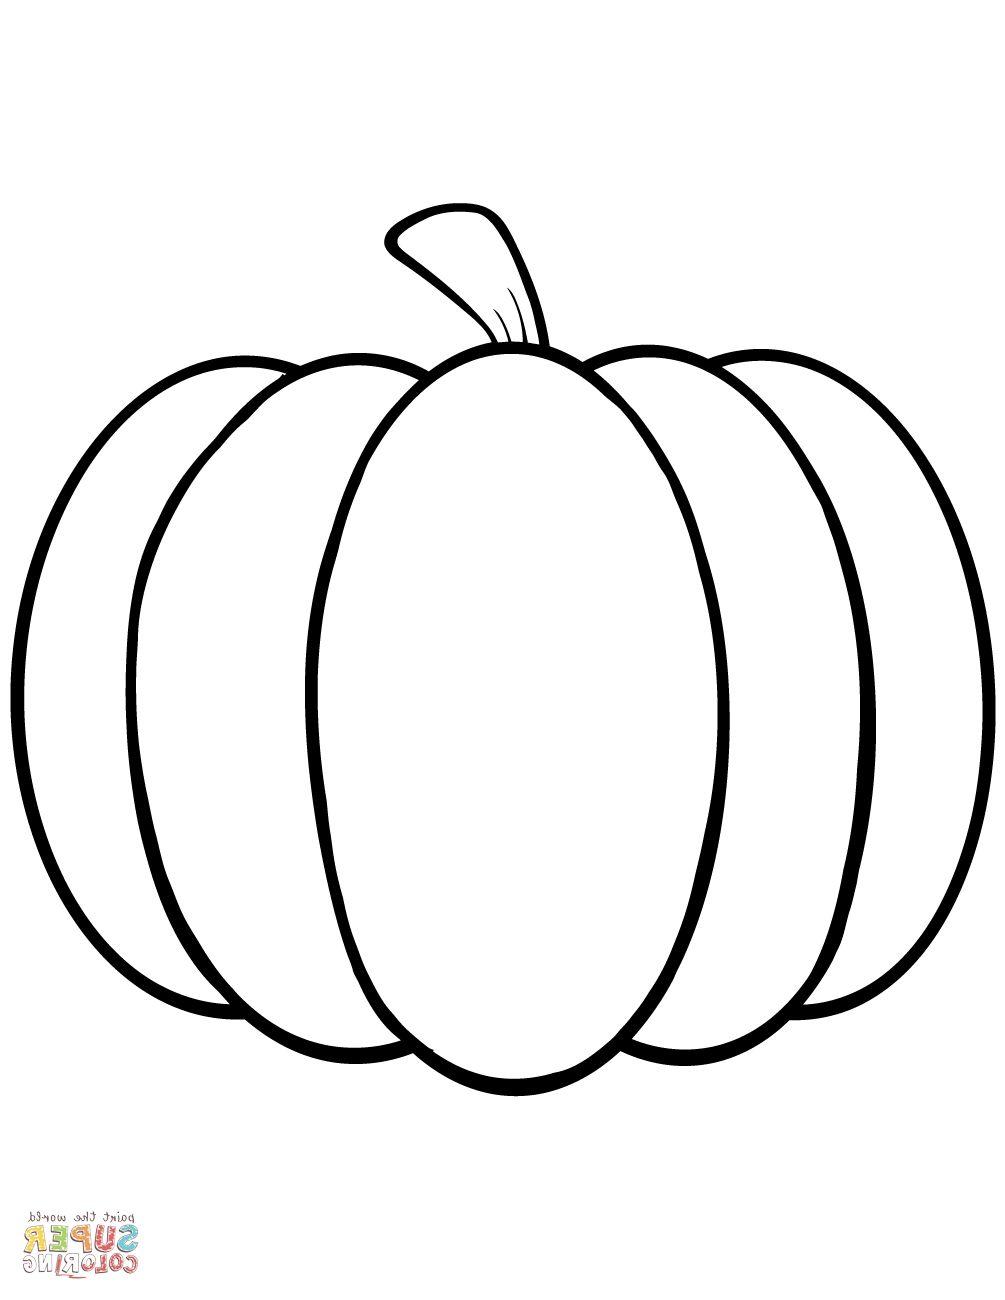 photograph regarding Printable Pumpkins Coloring Pages titled Pumpkin Coloring Sheets Coloring Web site Pumpkin coloring